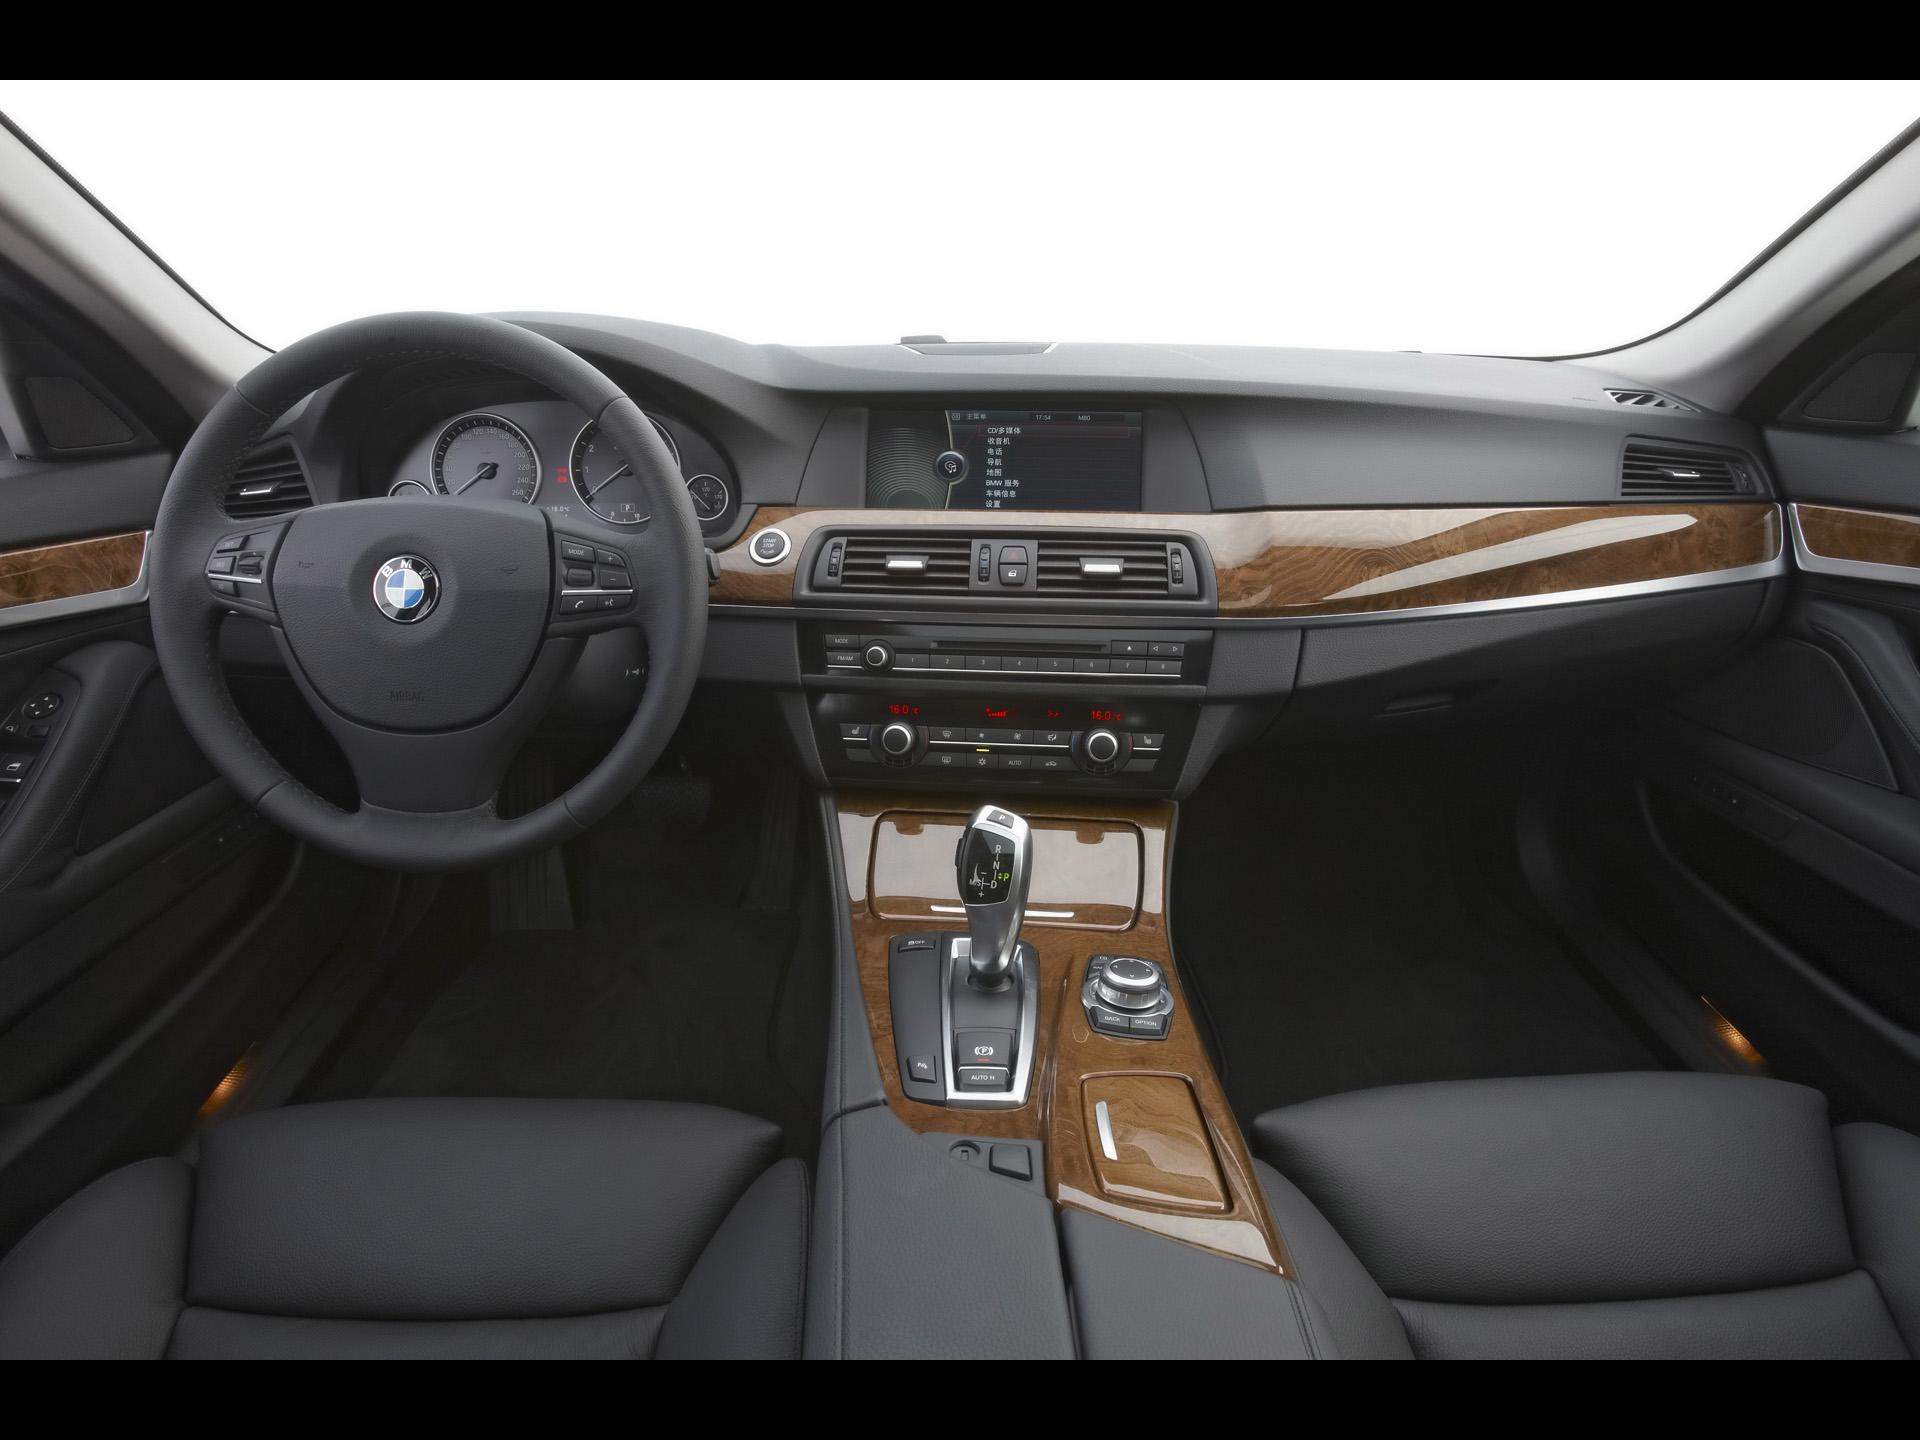 2010 BMW 5 Series Long Wheelbase Sedan Dashboard 1920x1440